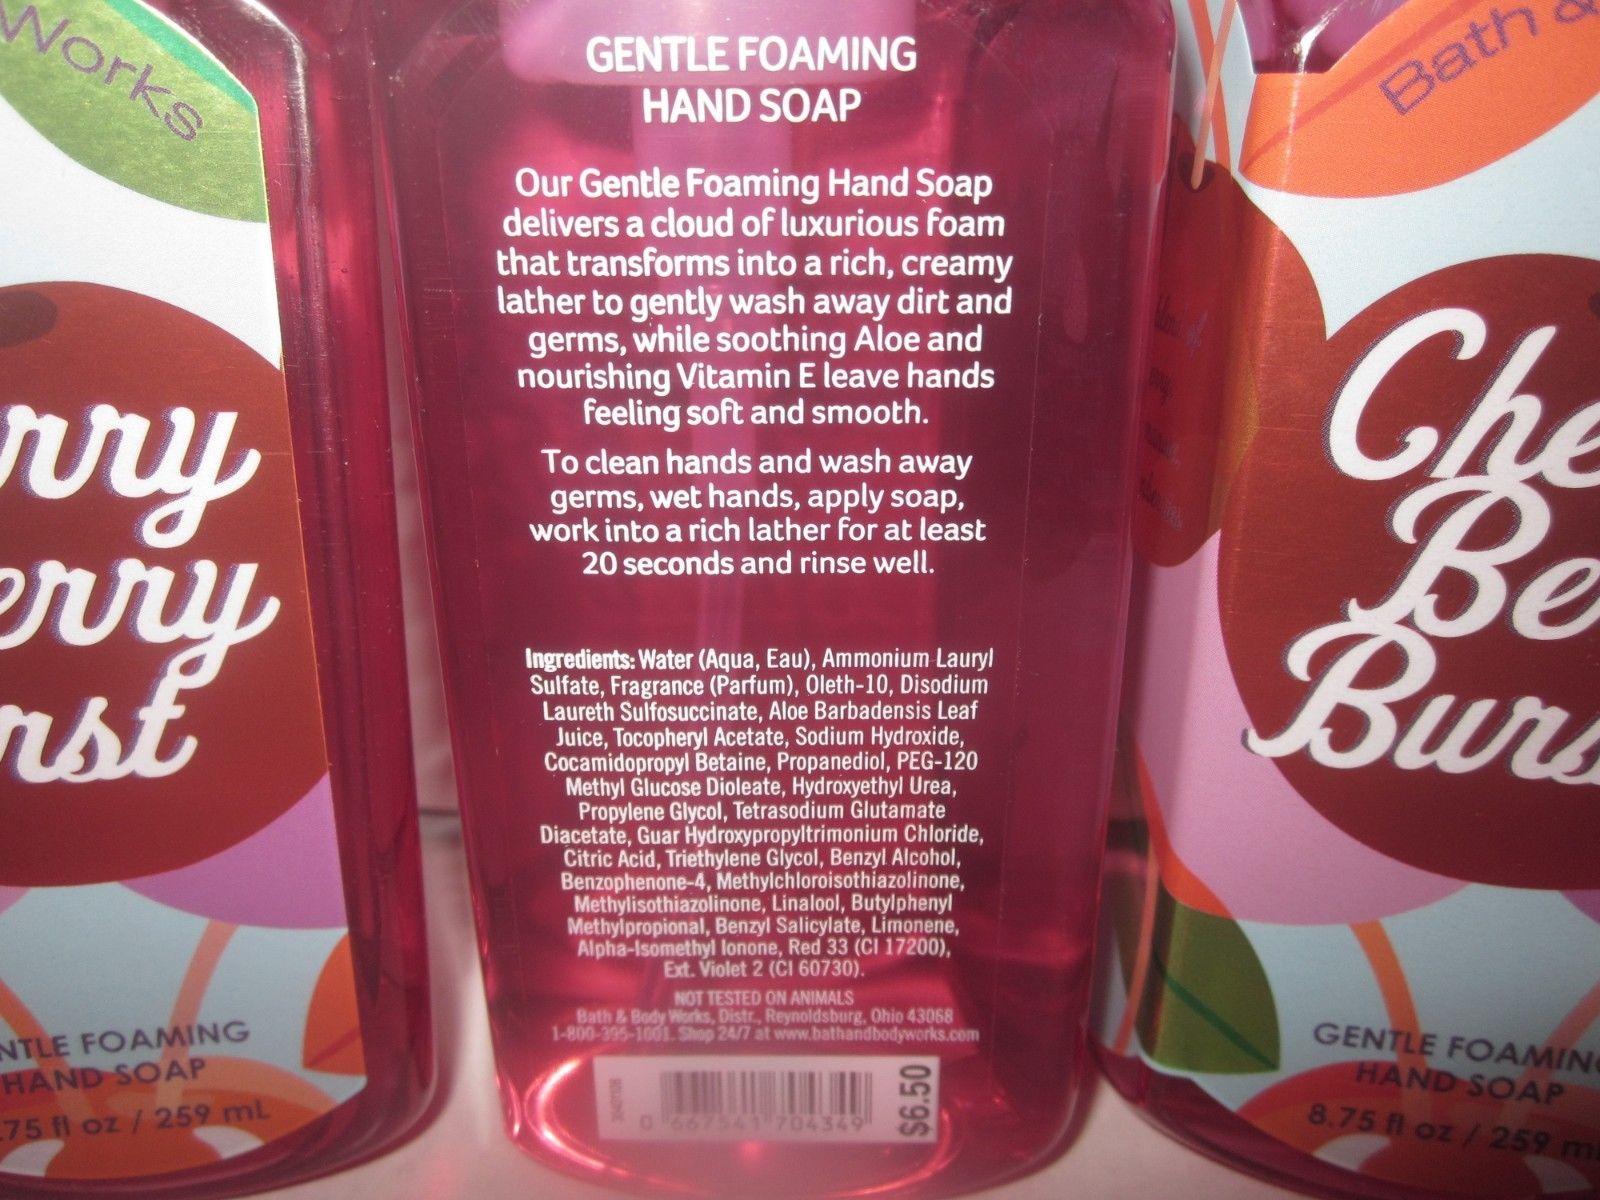 3 Bath & Body Works Gentle Foaming Hand Soap pomegranate Cherry Berry Burst